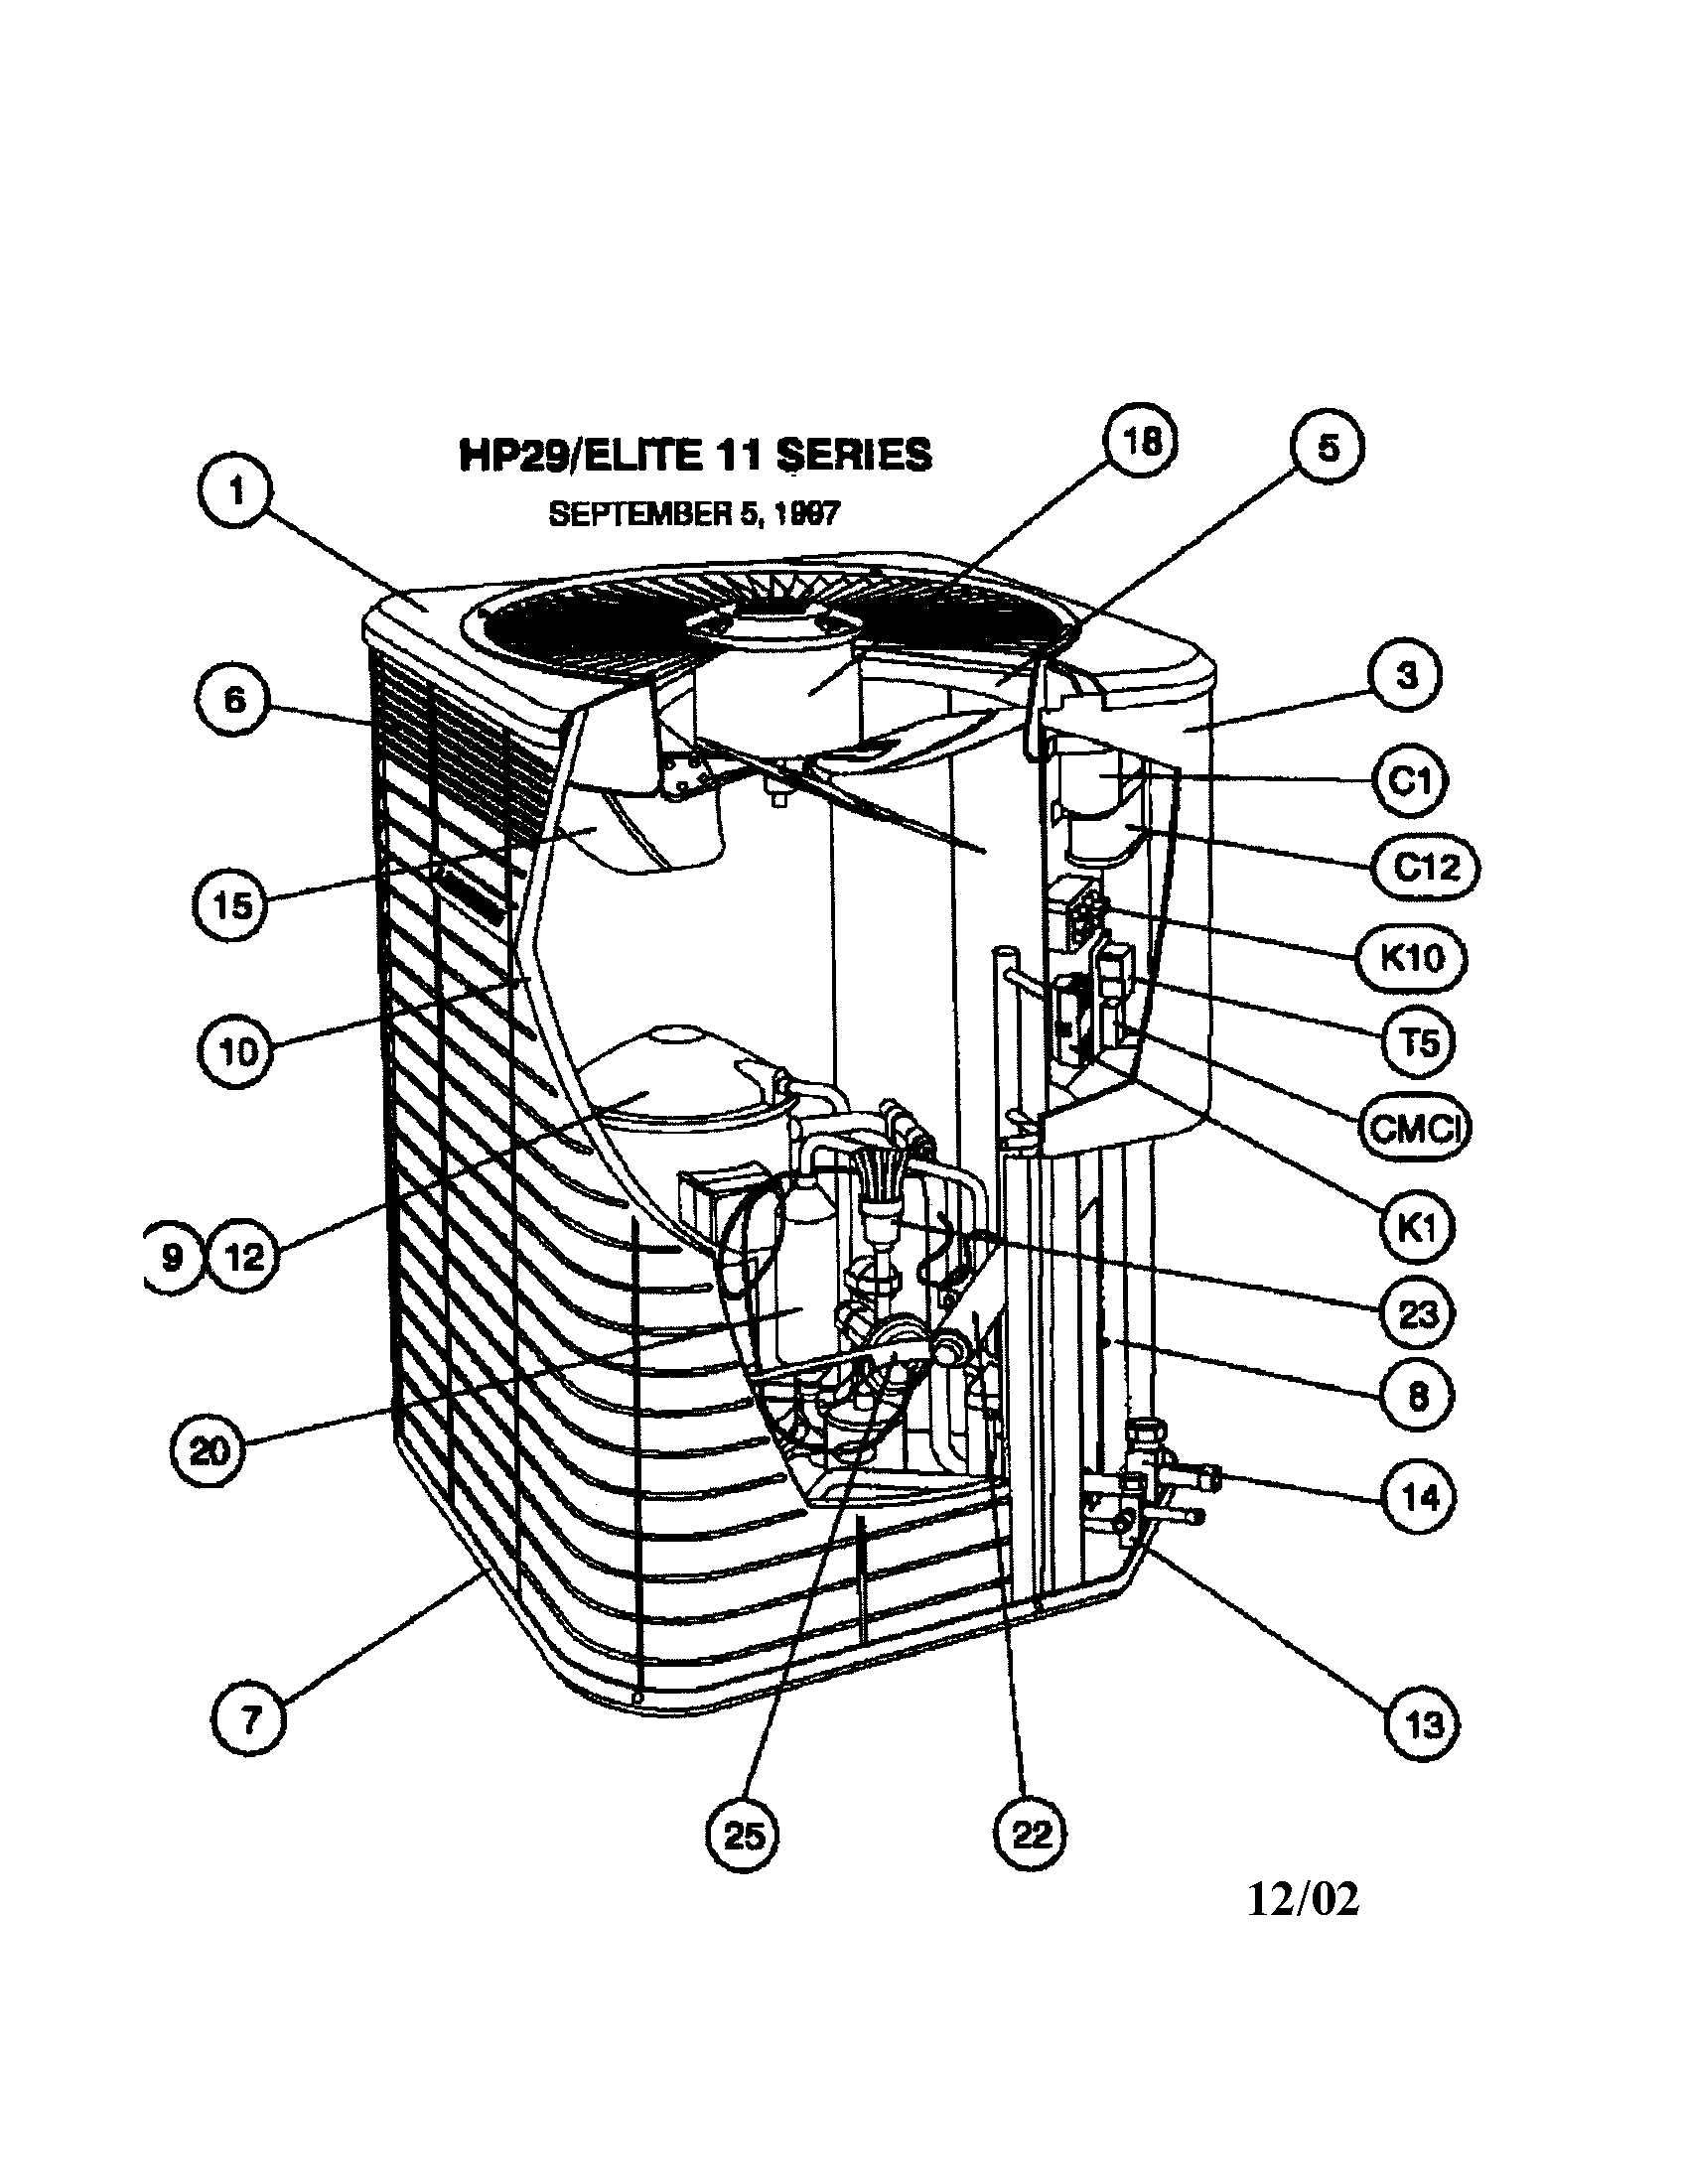 Lennox model hp29 048 1p air conditioner heat pump outside unit rh searspartsdirect lennox air